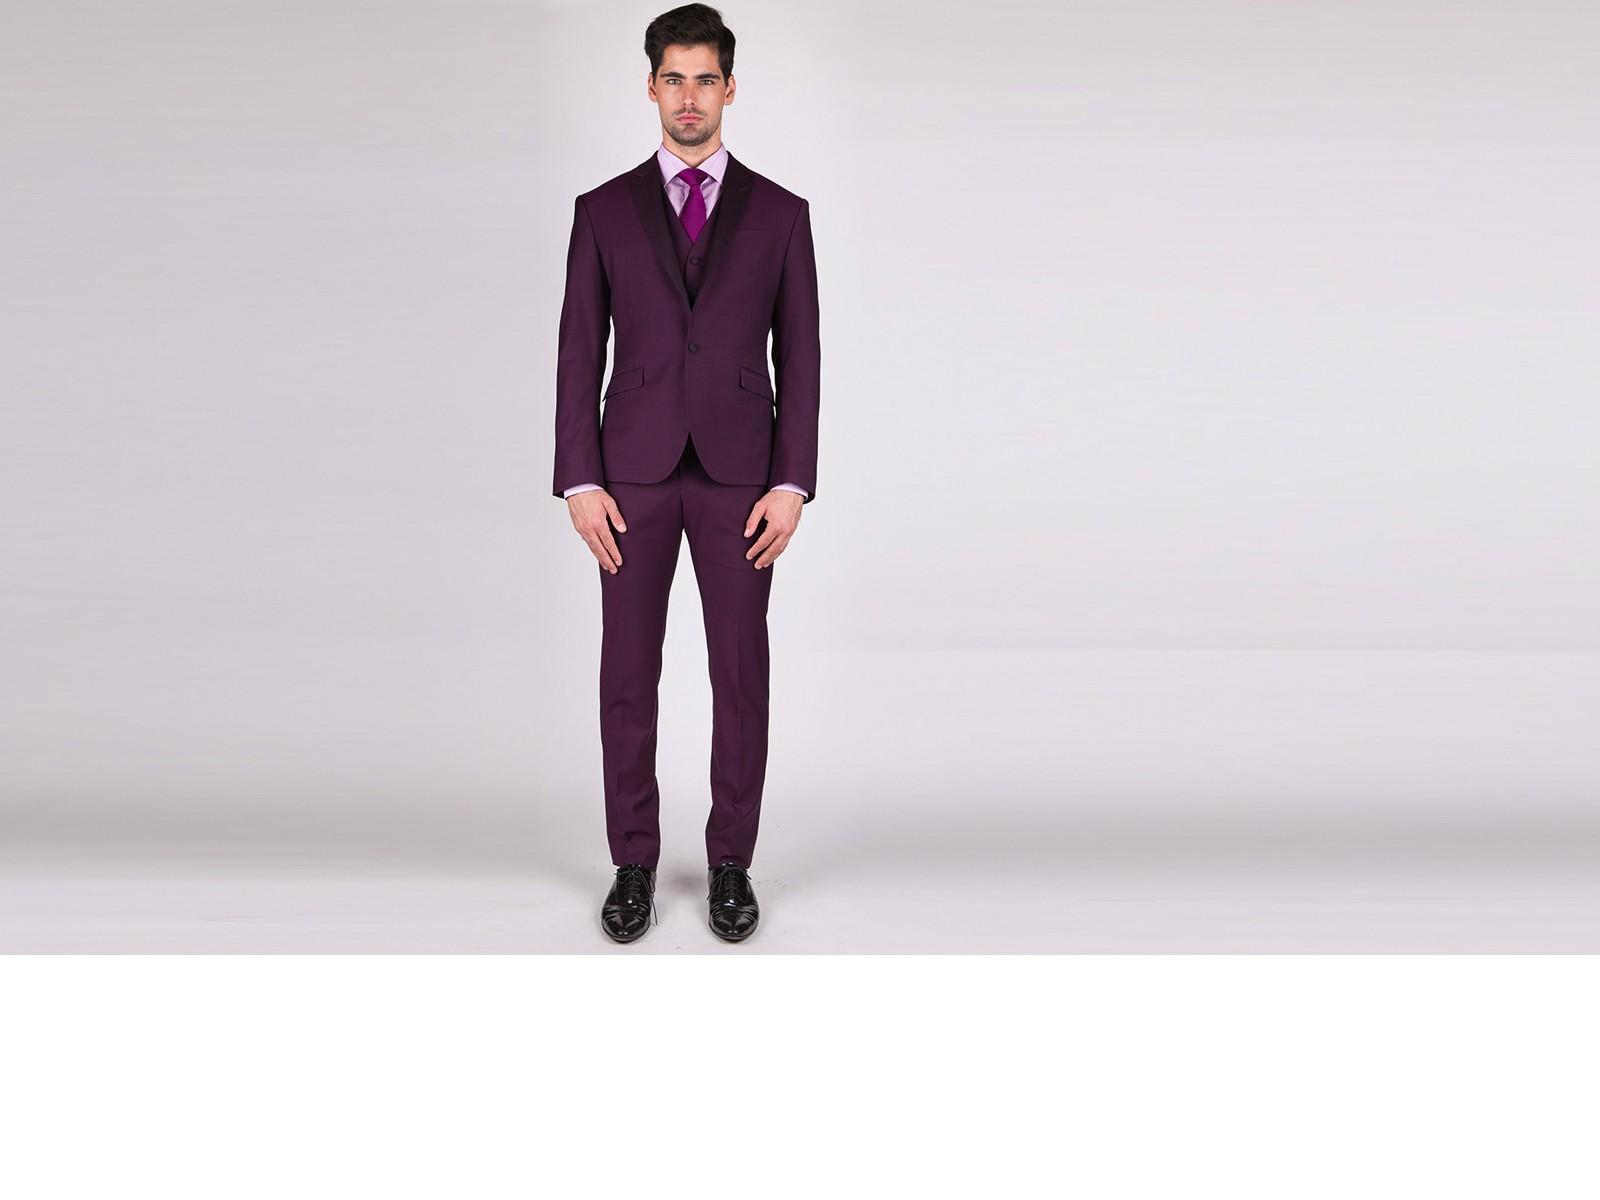 The Gambler - Luxurious 3 Piece Custom Suit